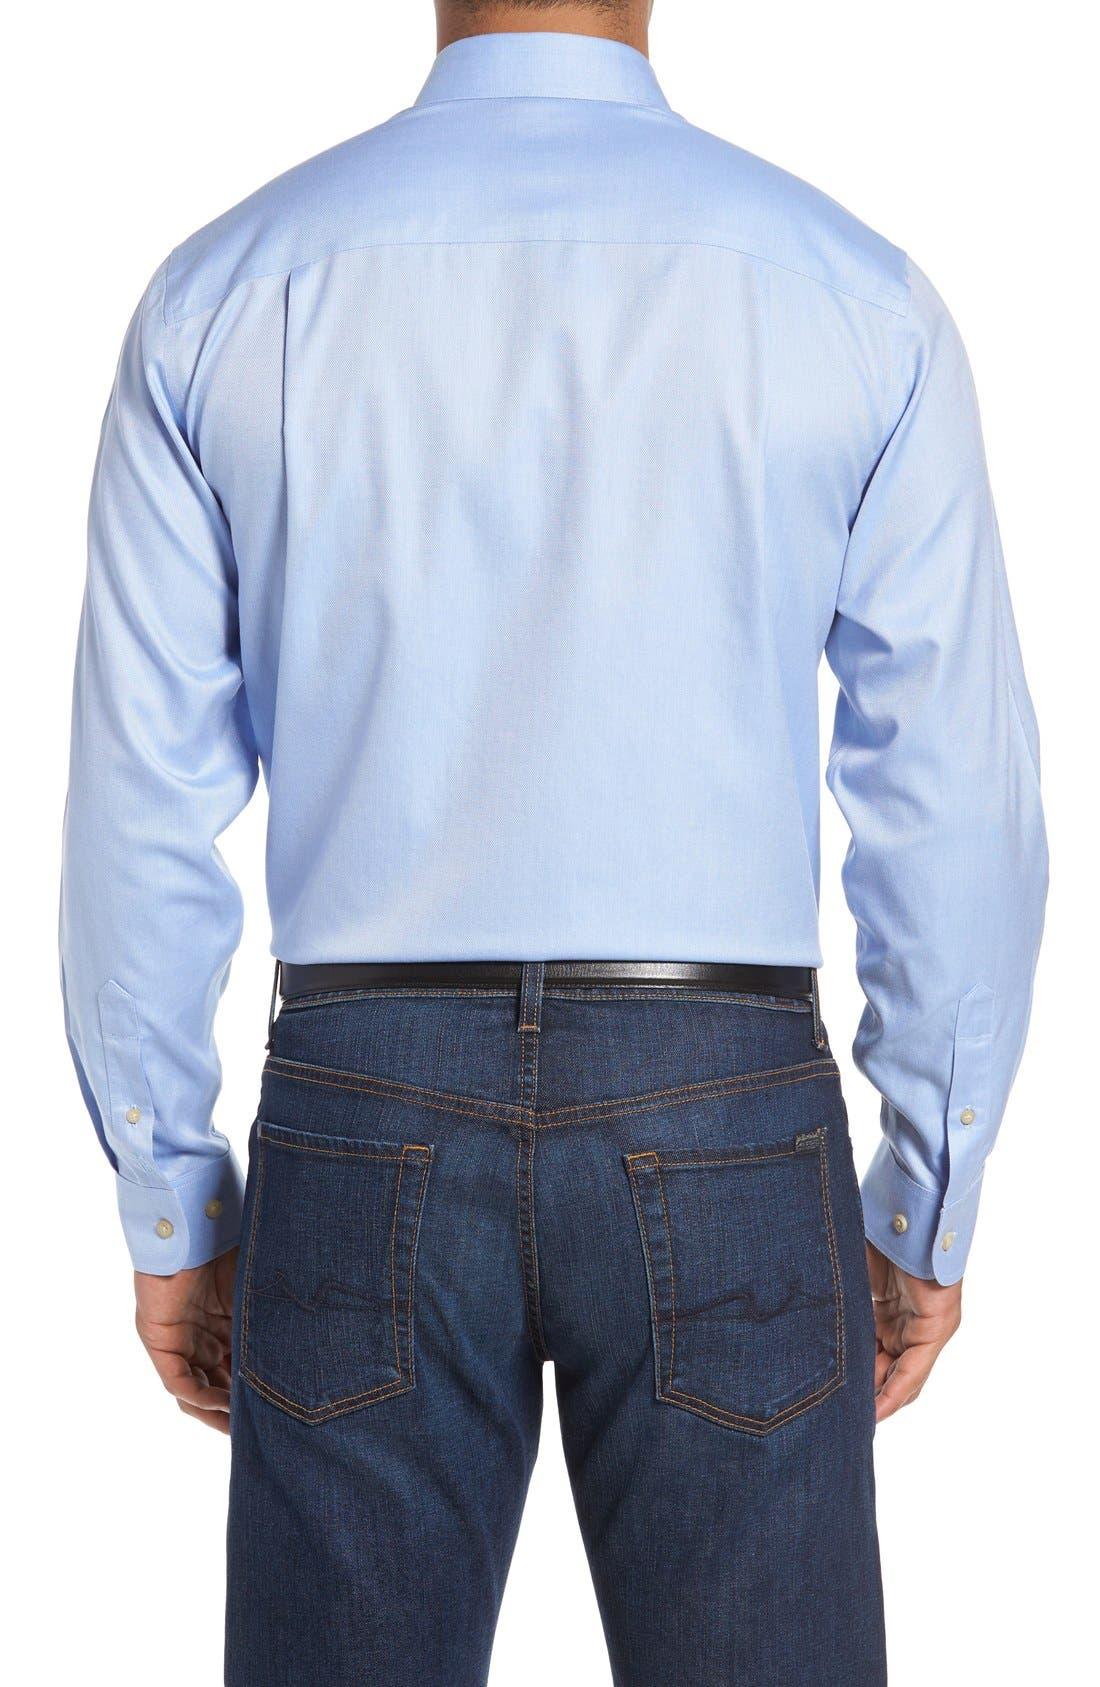 San Juan Classic Fit Wrinkle Free Solid Sport Shirt,                             Alternate thumbnail 2, color,                             Blue